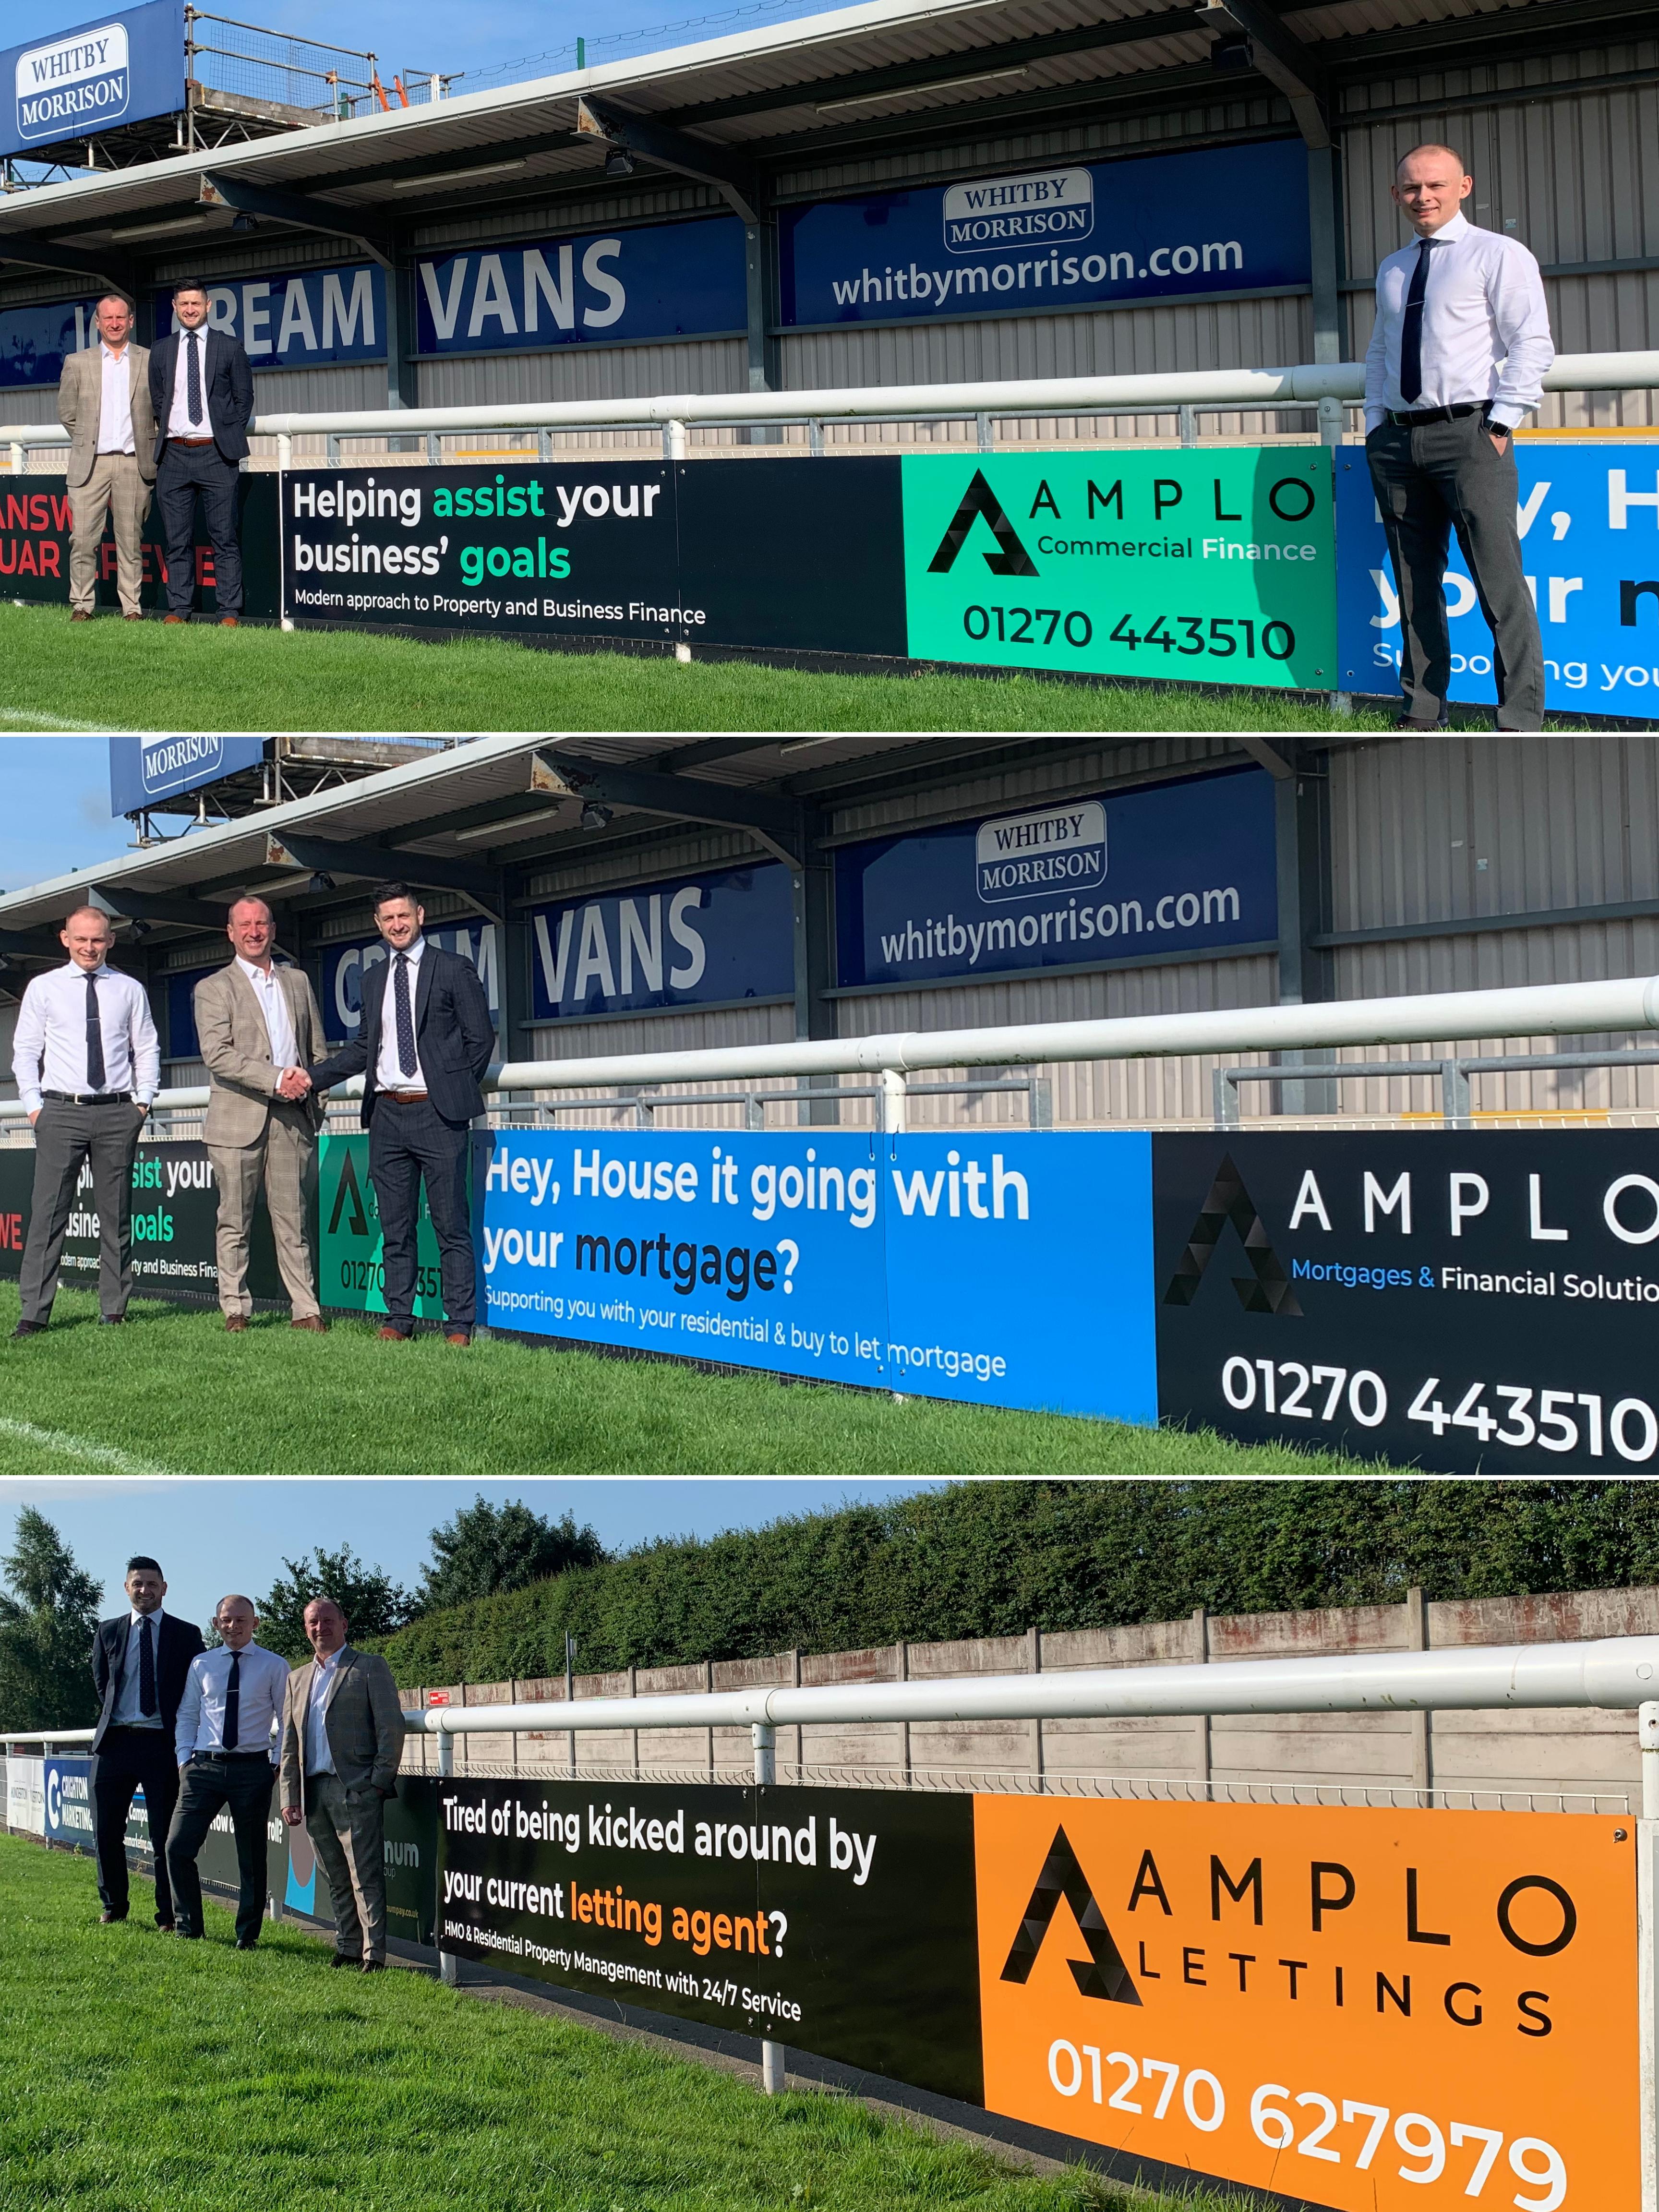 Amplo Group Sponsoring Nantwich Town FC